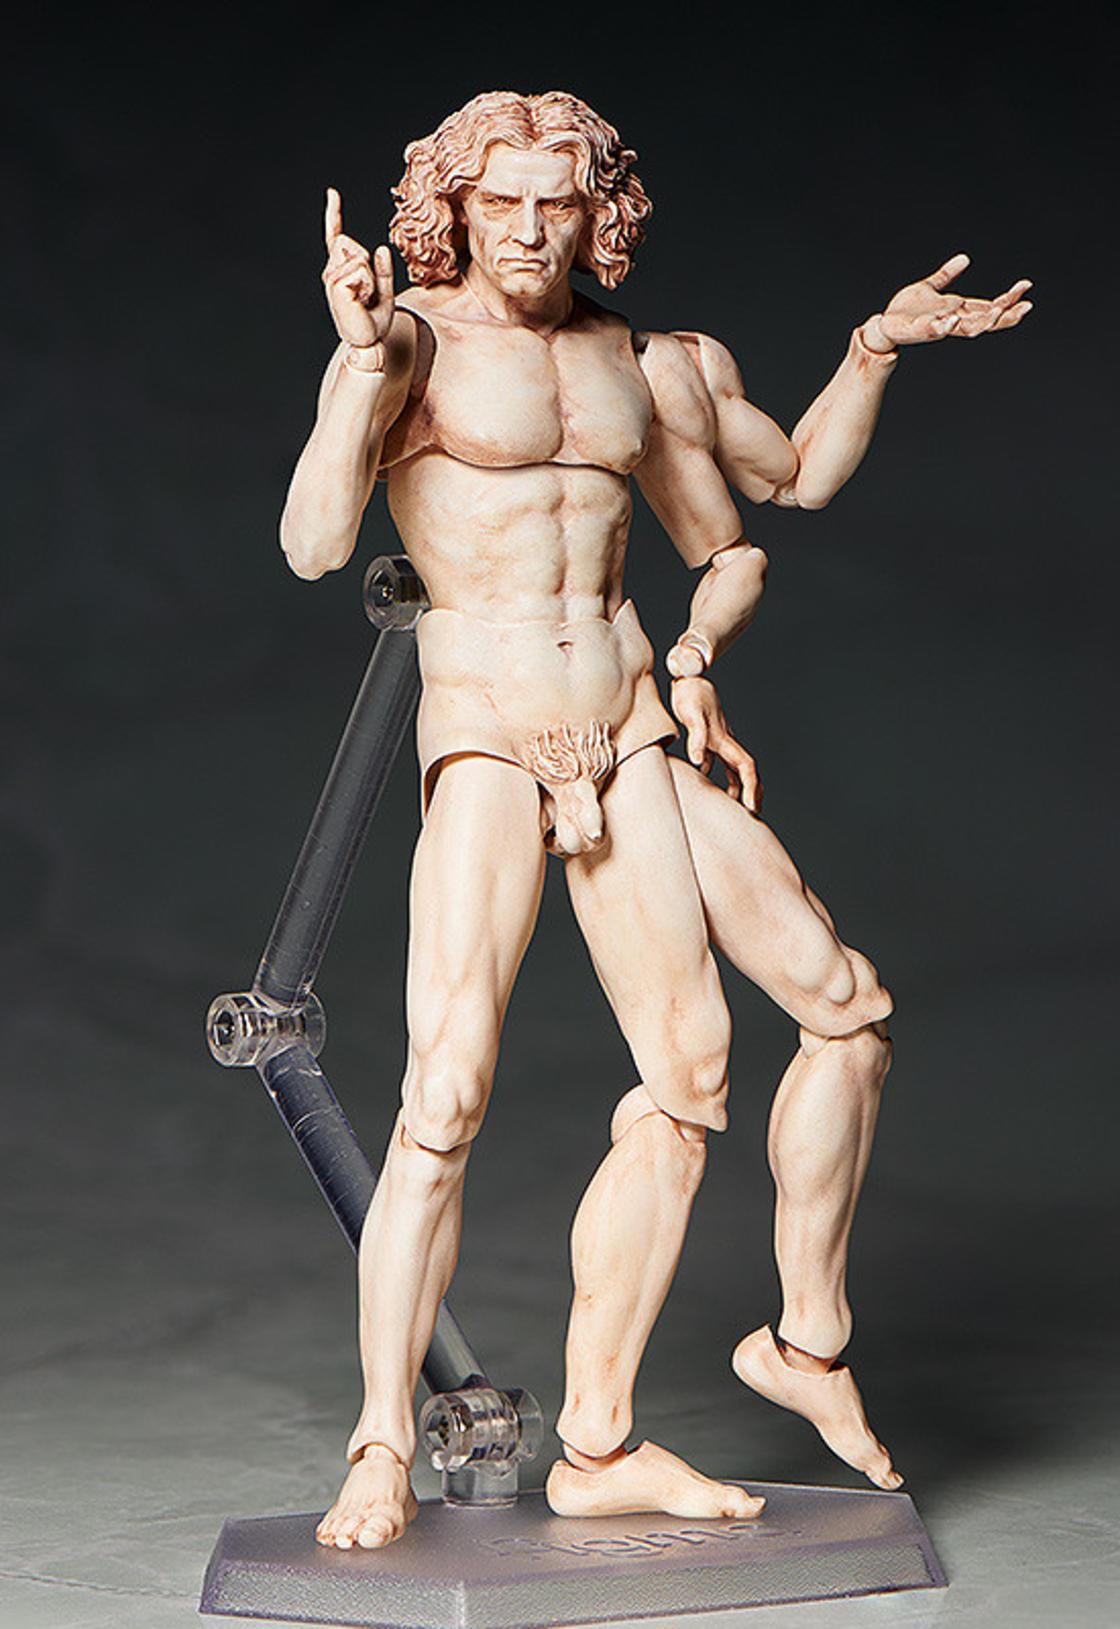 Vitruvian Man – The famous drawing by Leonardo da Vinci is now a figurine!